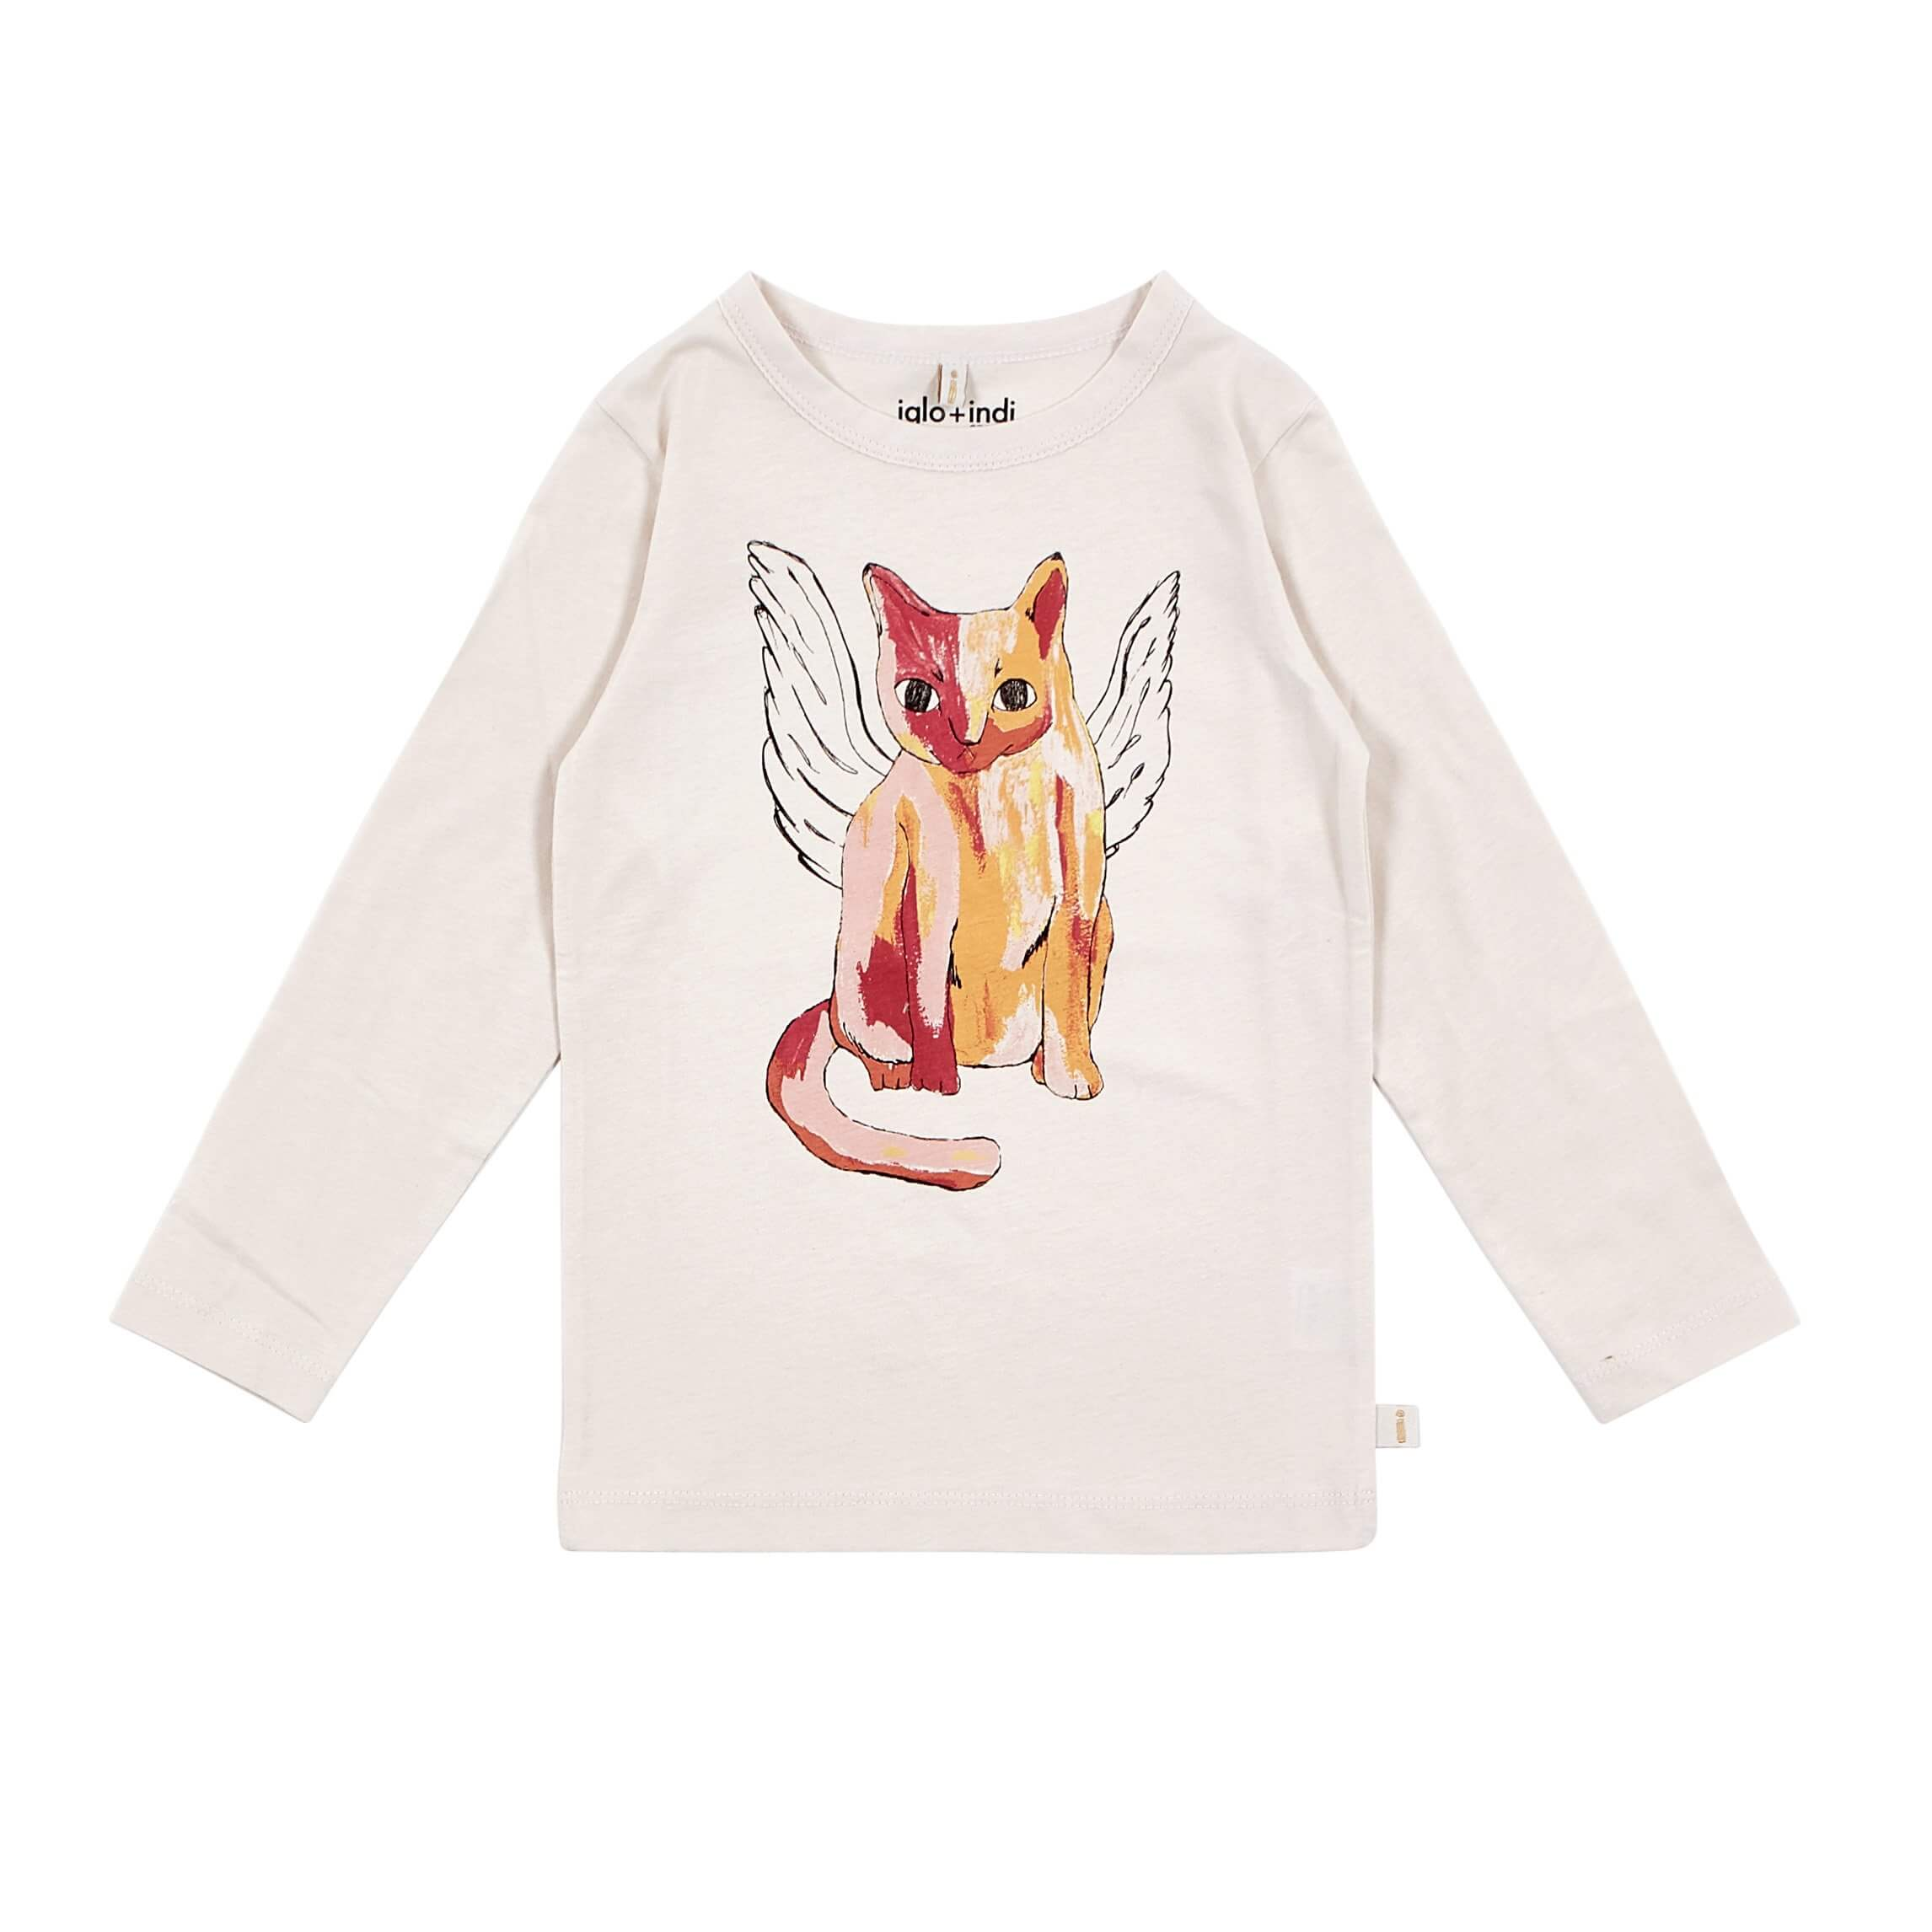 IGLO+INDI Angel Cat/Katze Oberteil